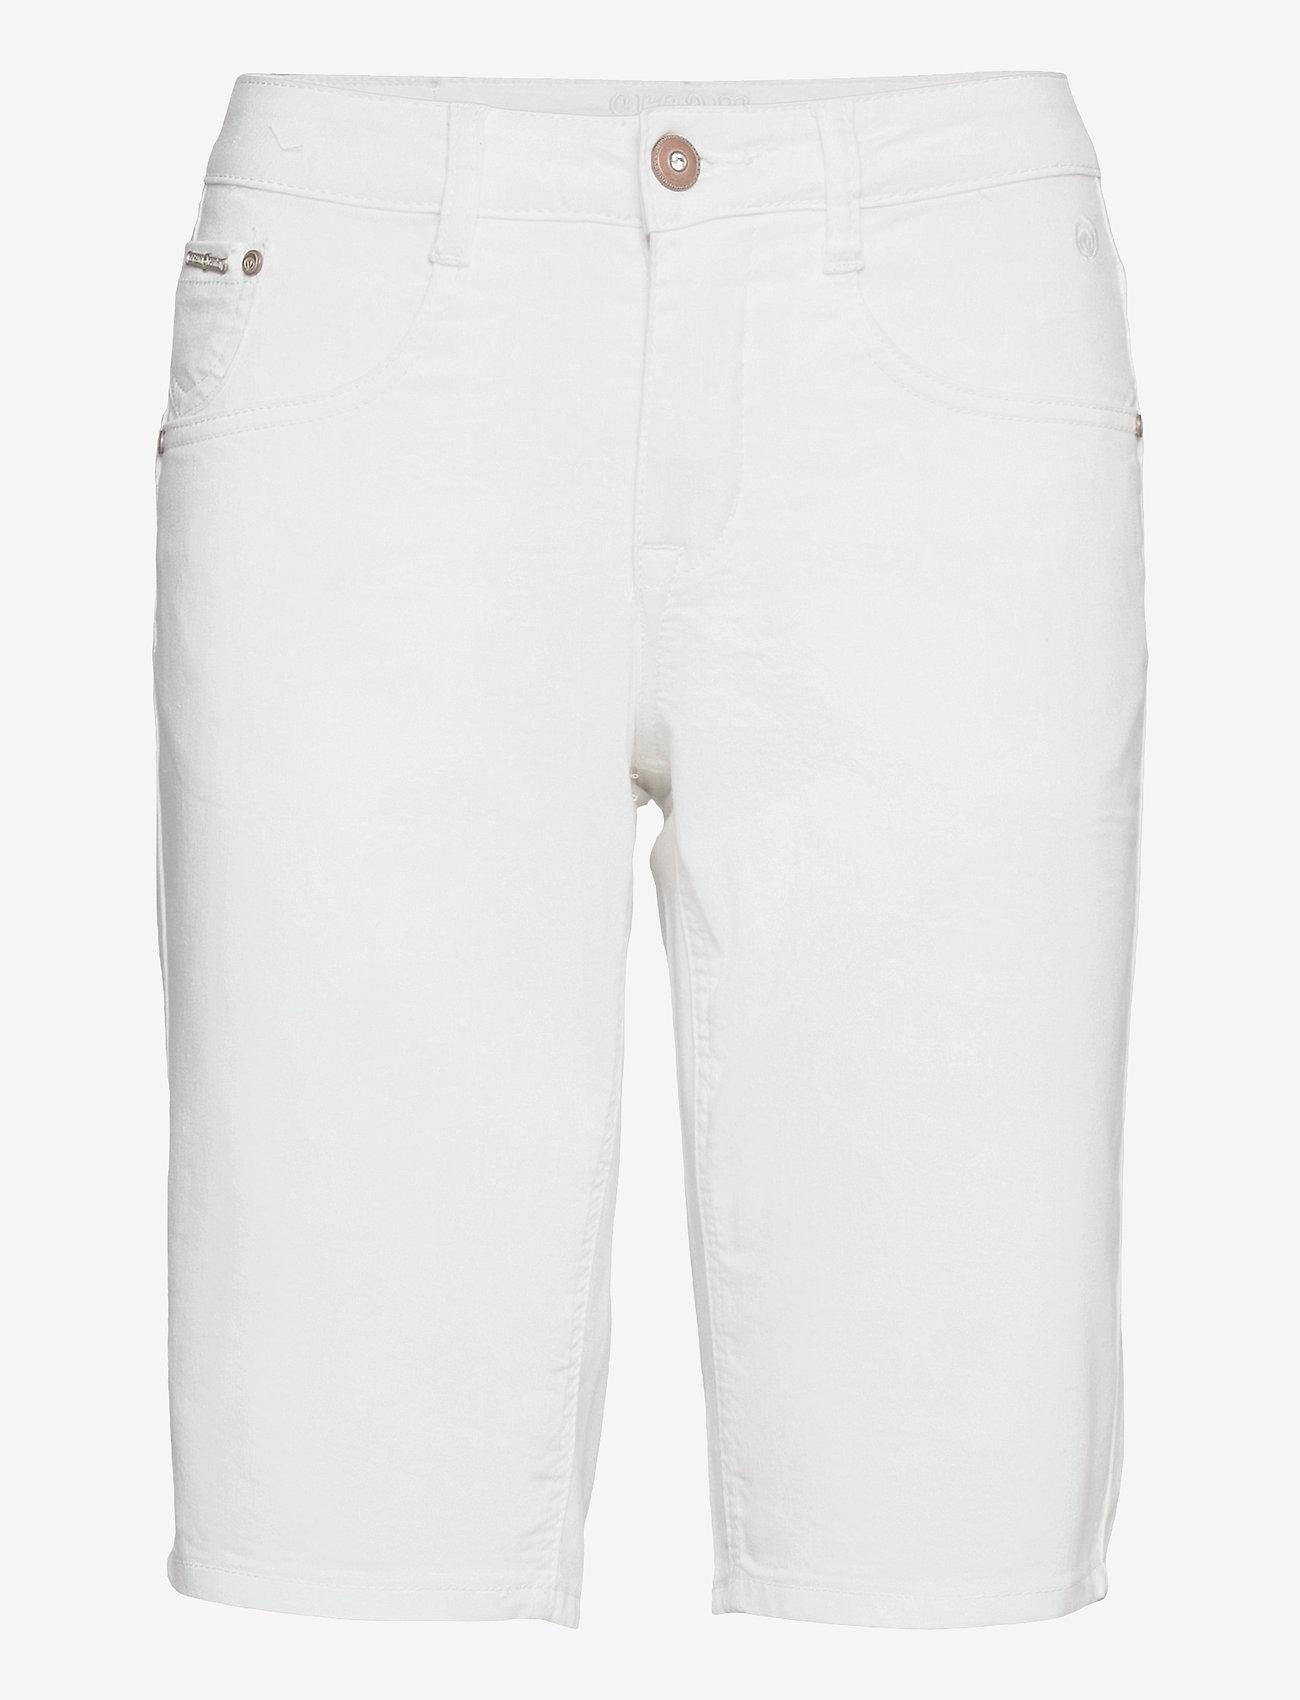 Cream - VavaCR Shorts - Coco Fit - bermudas - snow white - 0